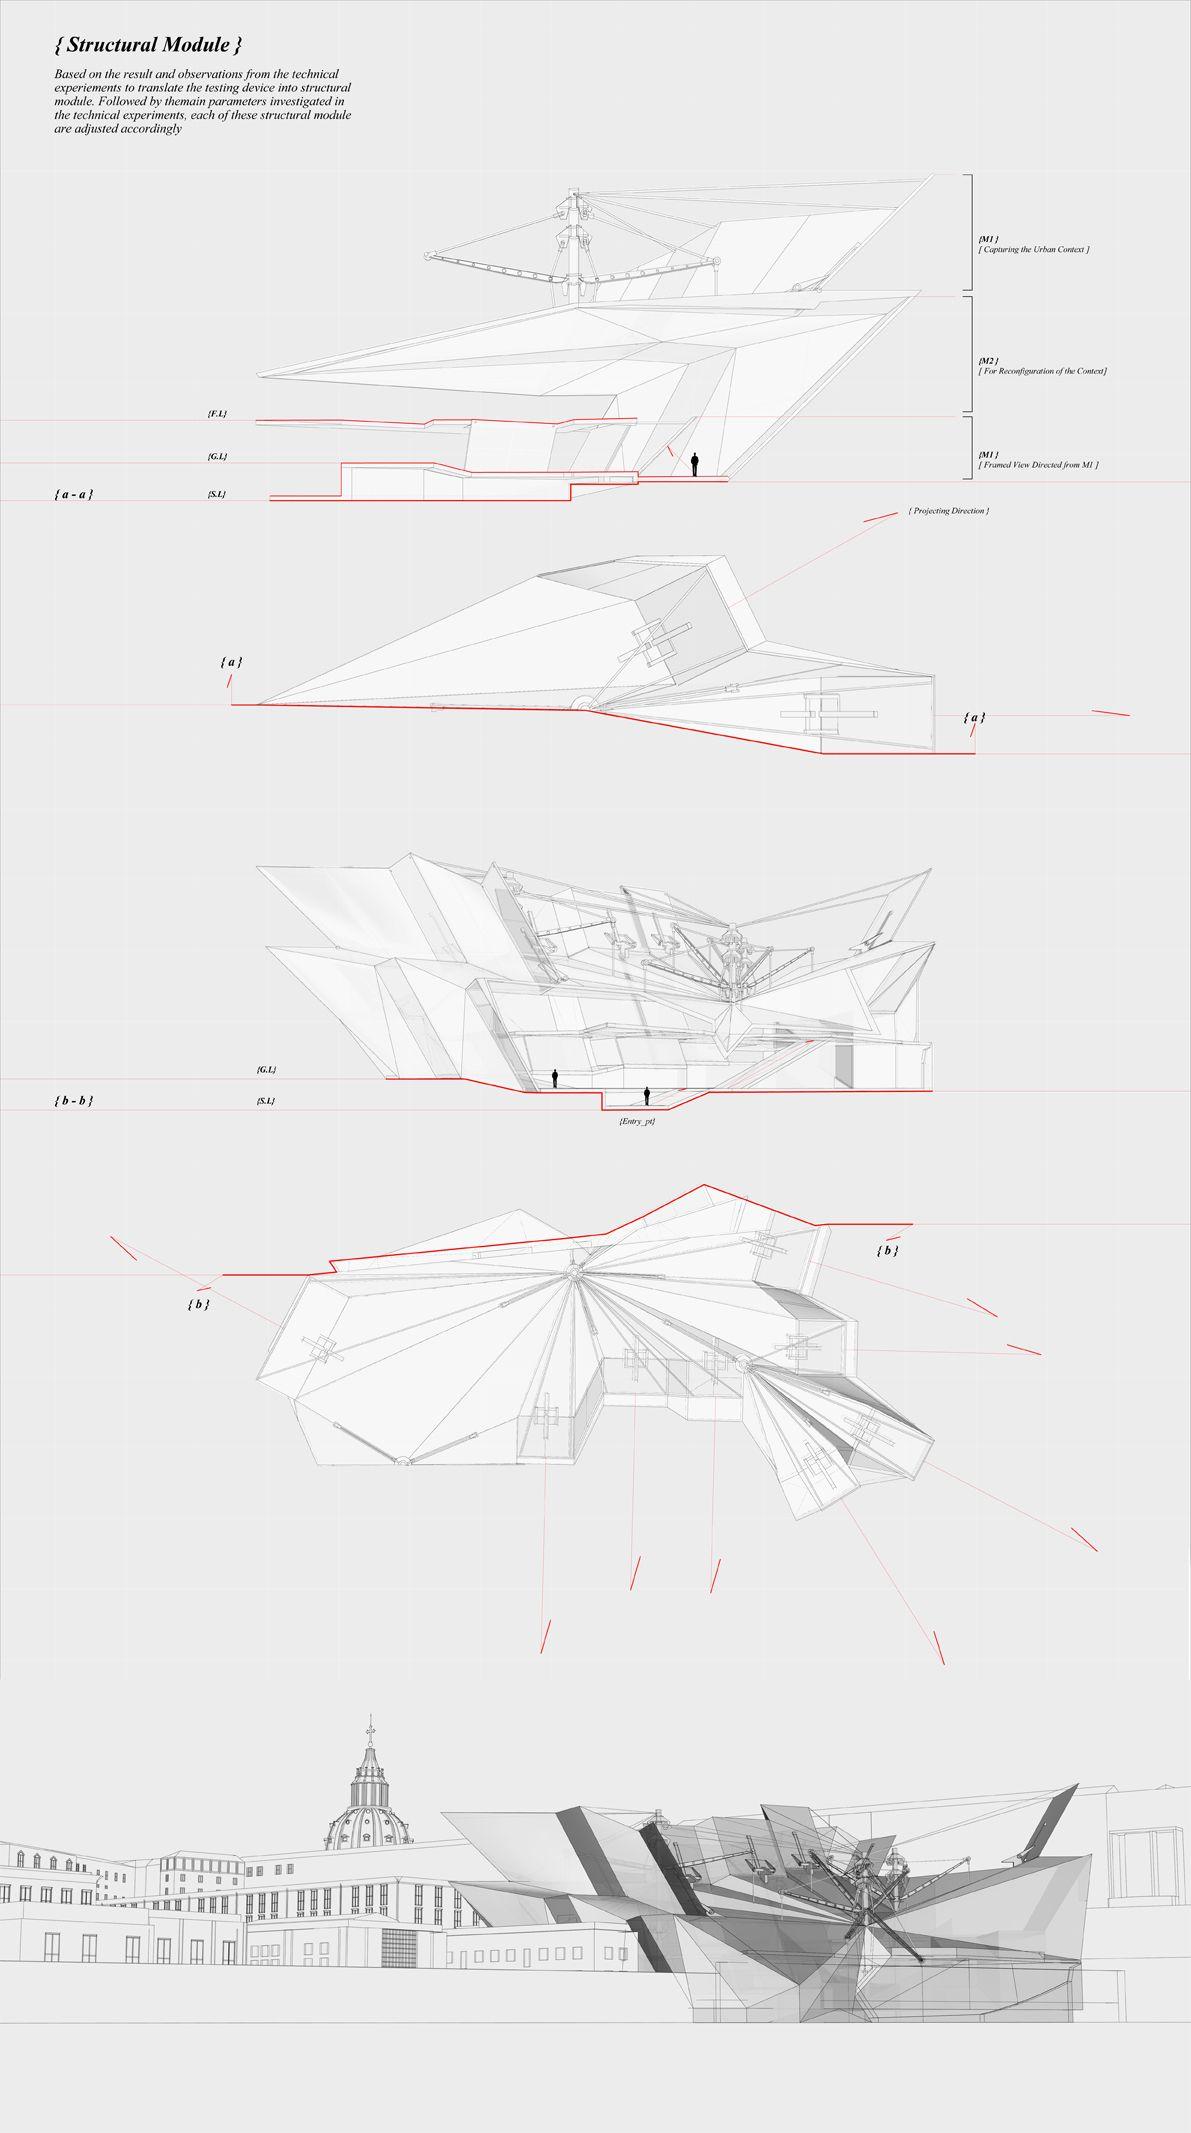 Structural Module